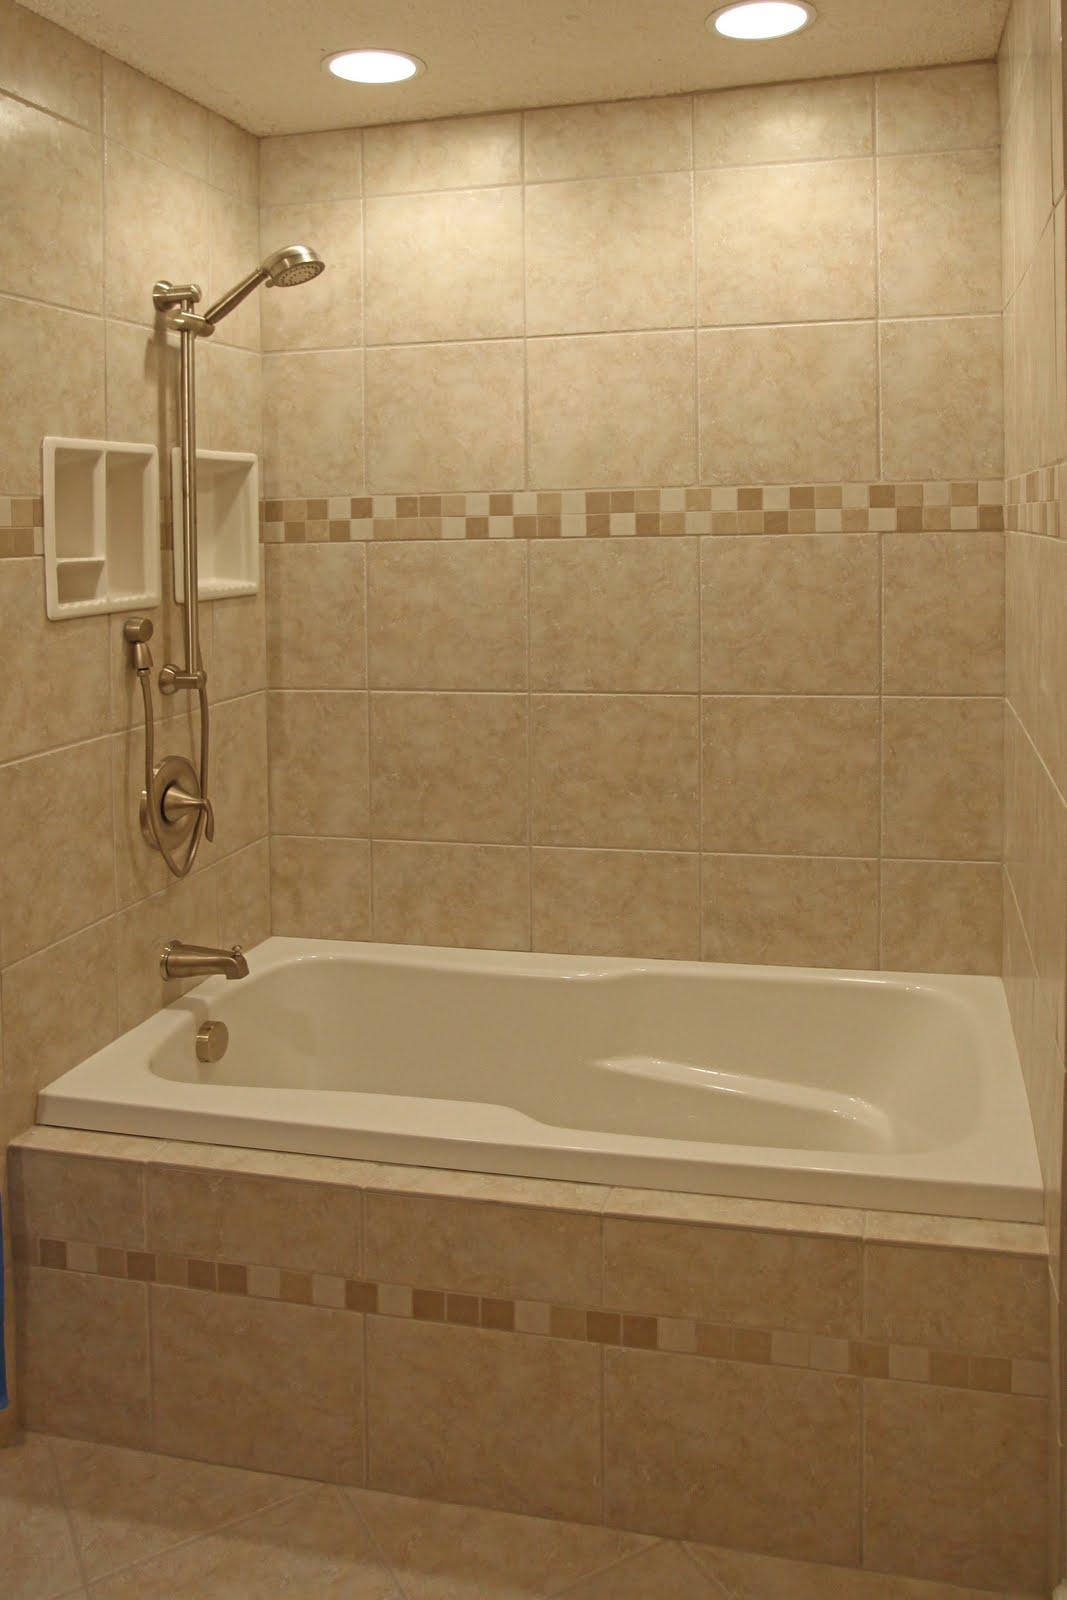 bathroom tile designs layout photo - 3